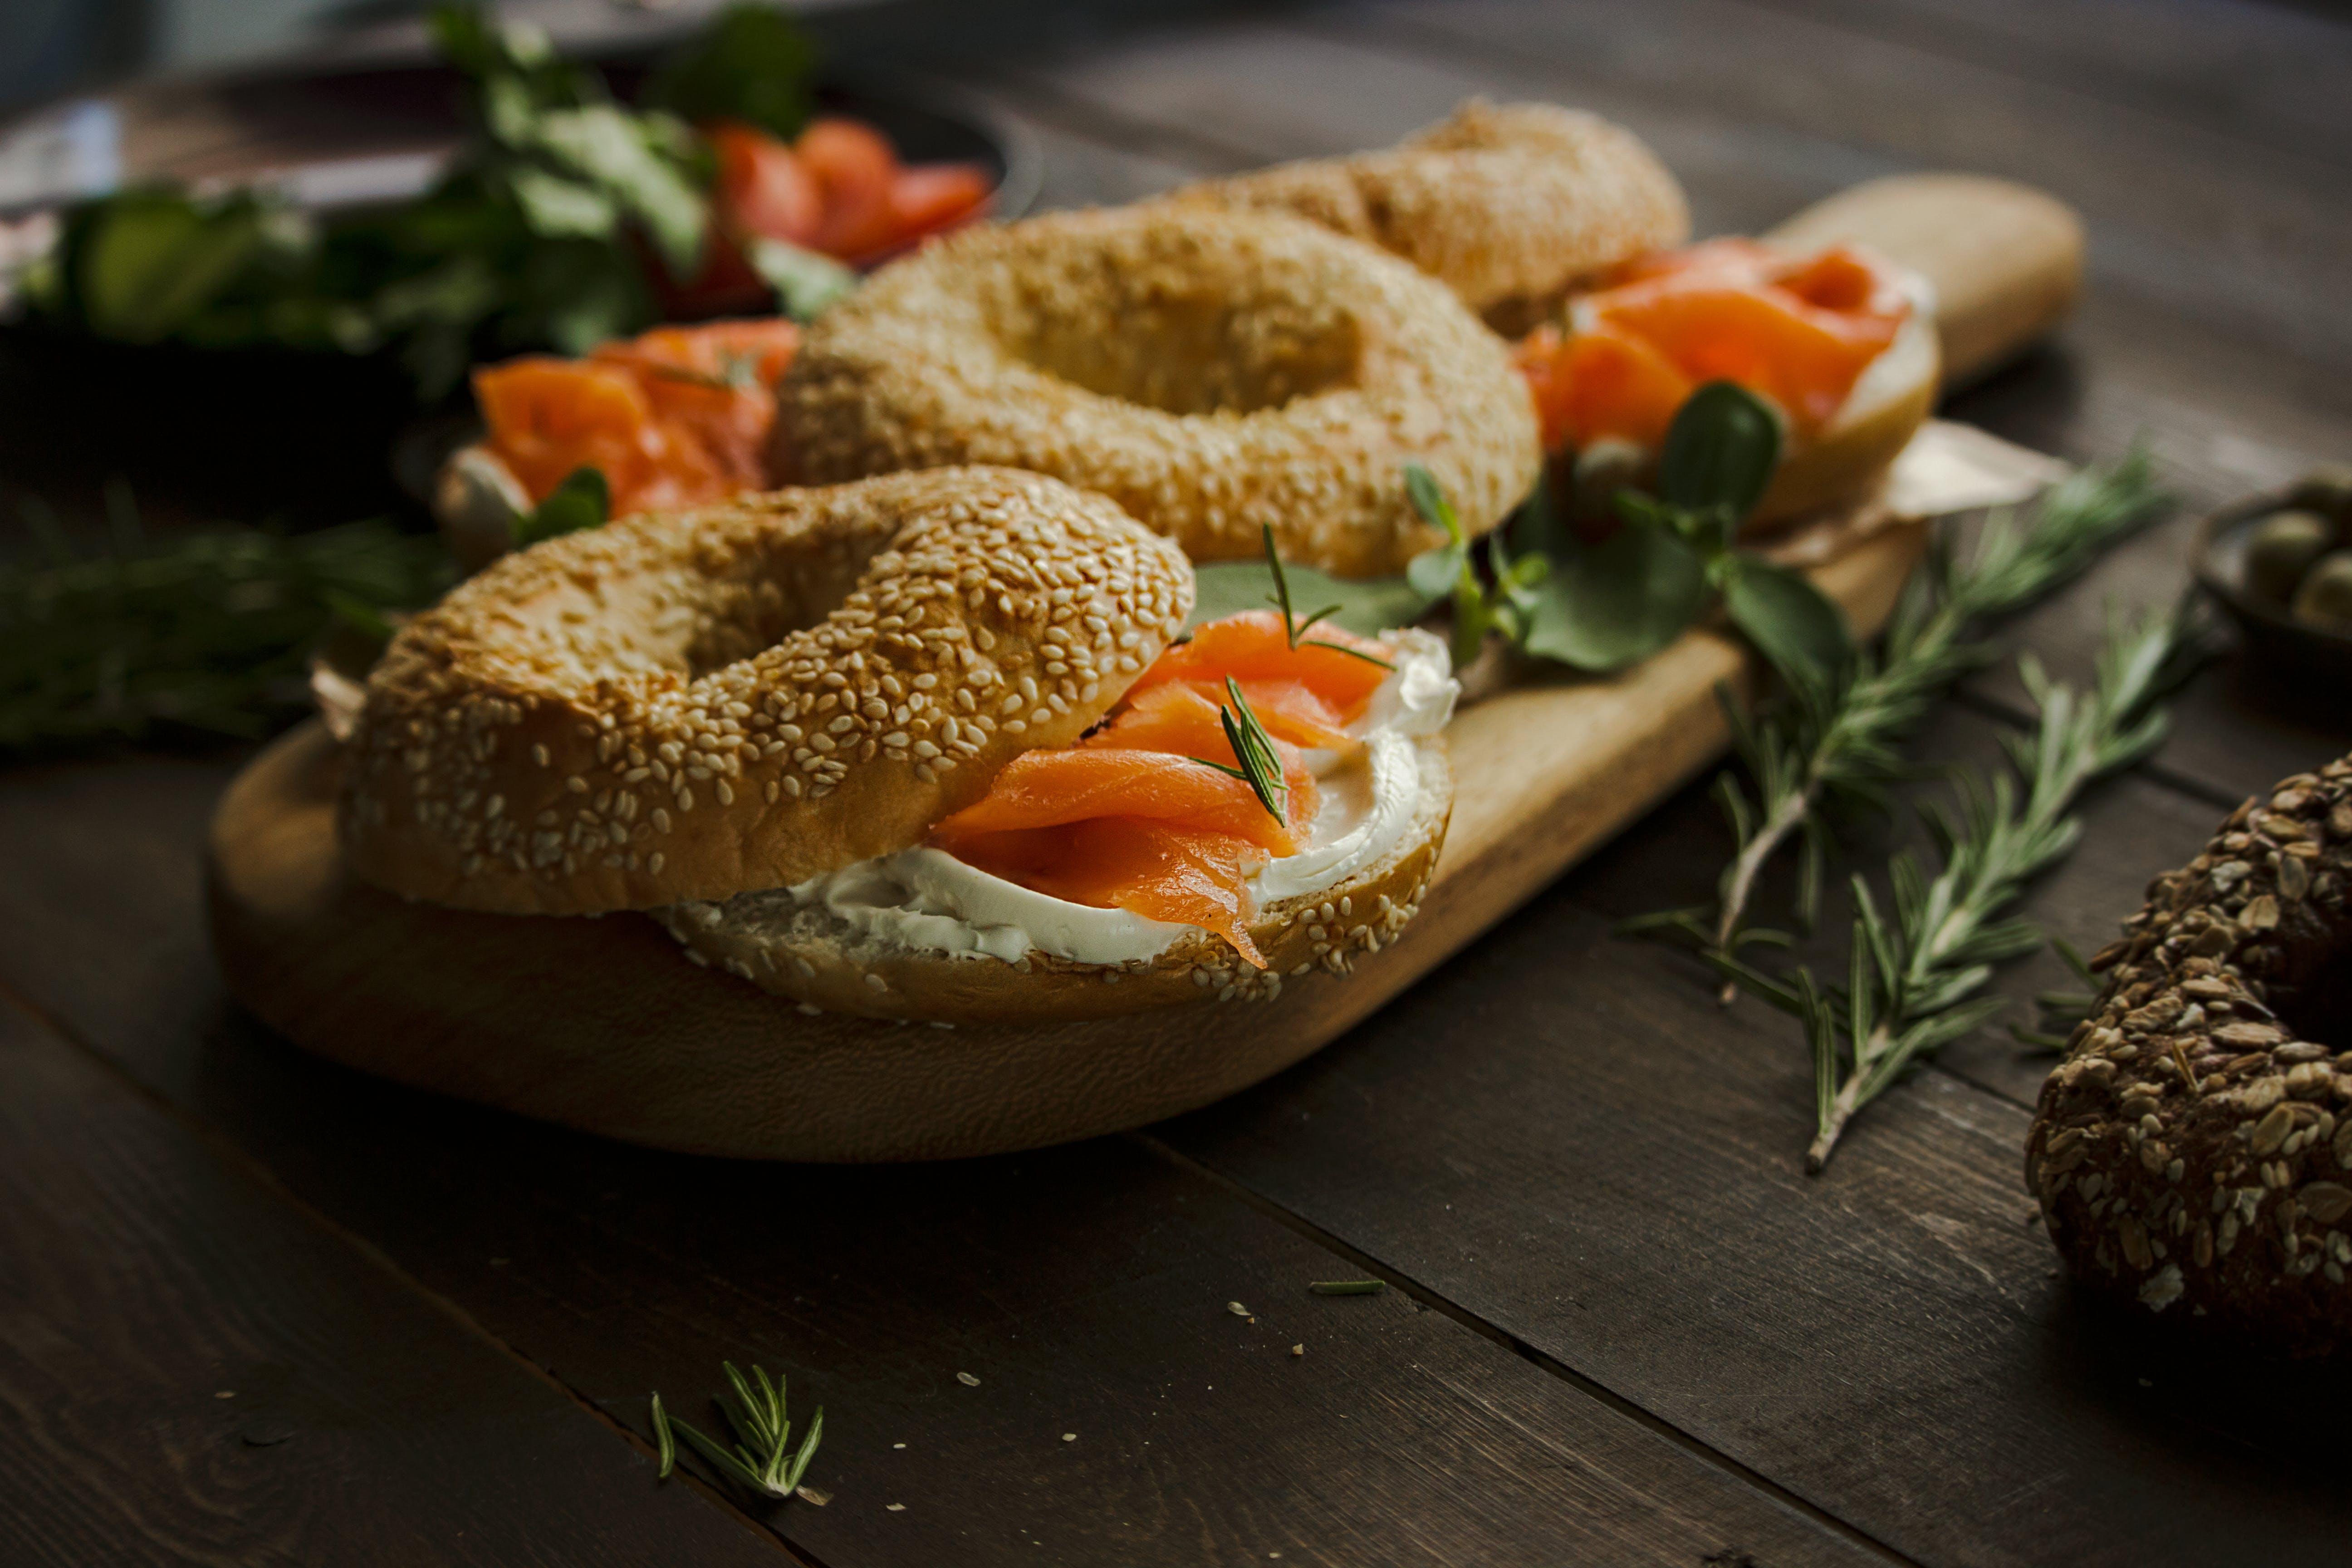 Bagel With Vegetables